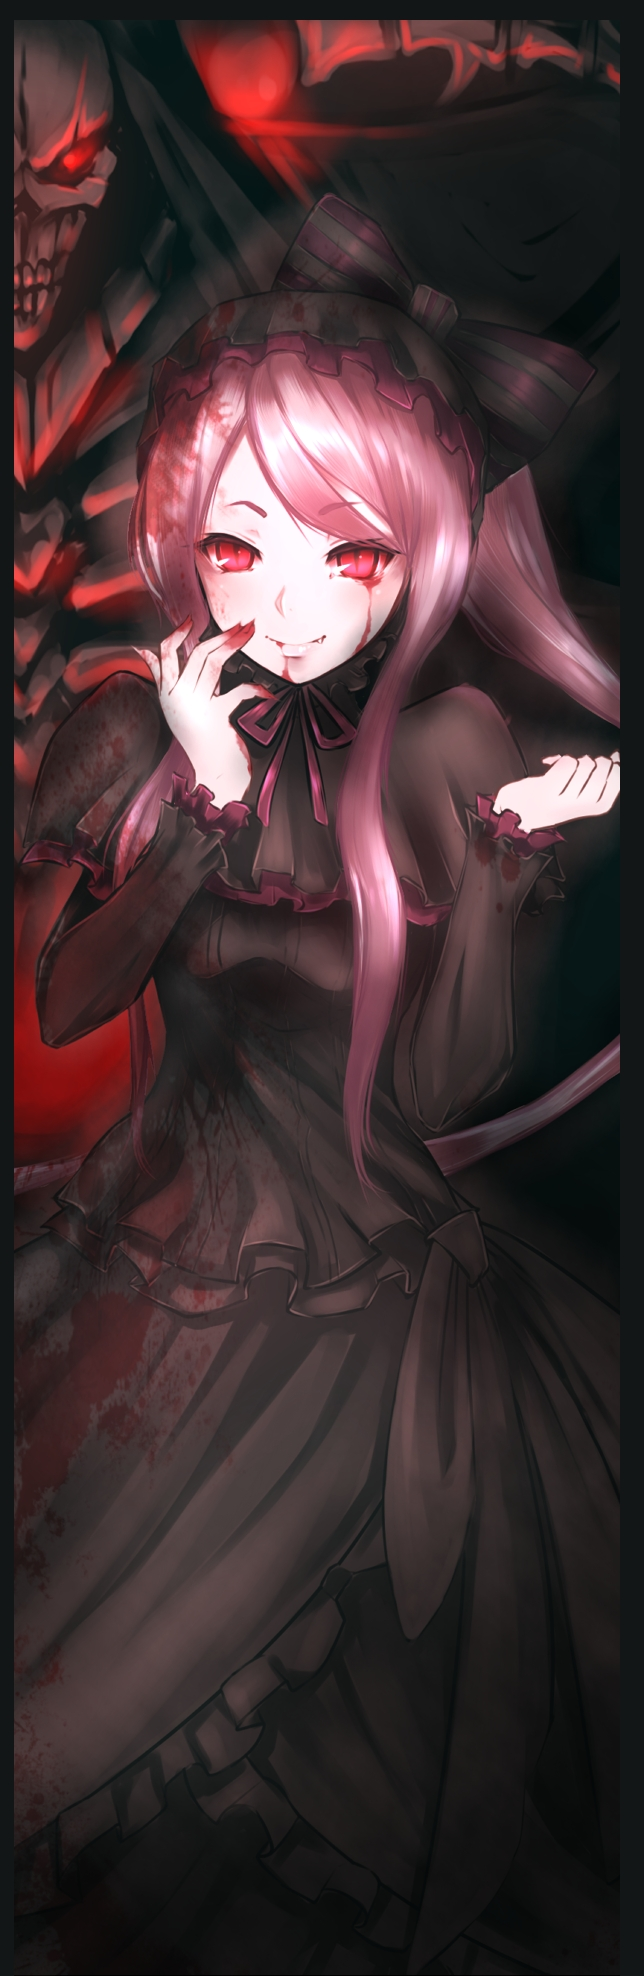 Tags: Anime, Pixiv Id 7165478, Overlord, Ainz Ooal Gown, Shalltear Bloodfallen, Fanart, Fanart From Pixiv, Pixiv